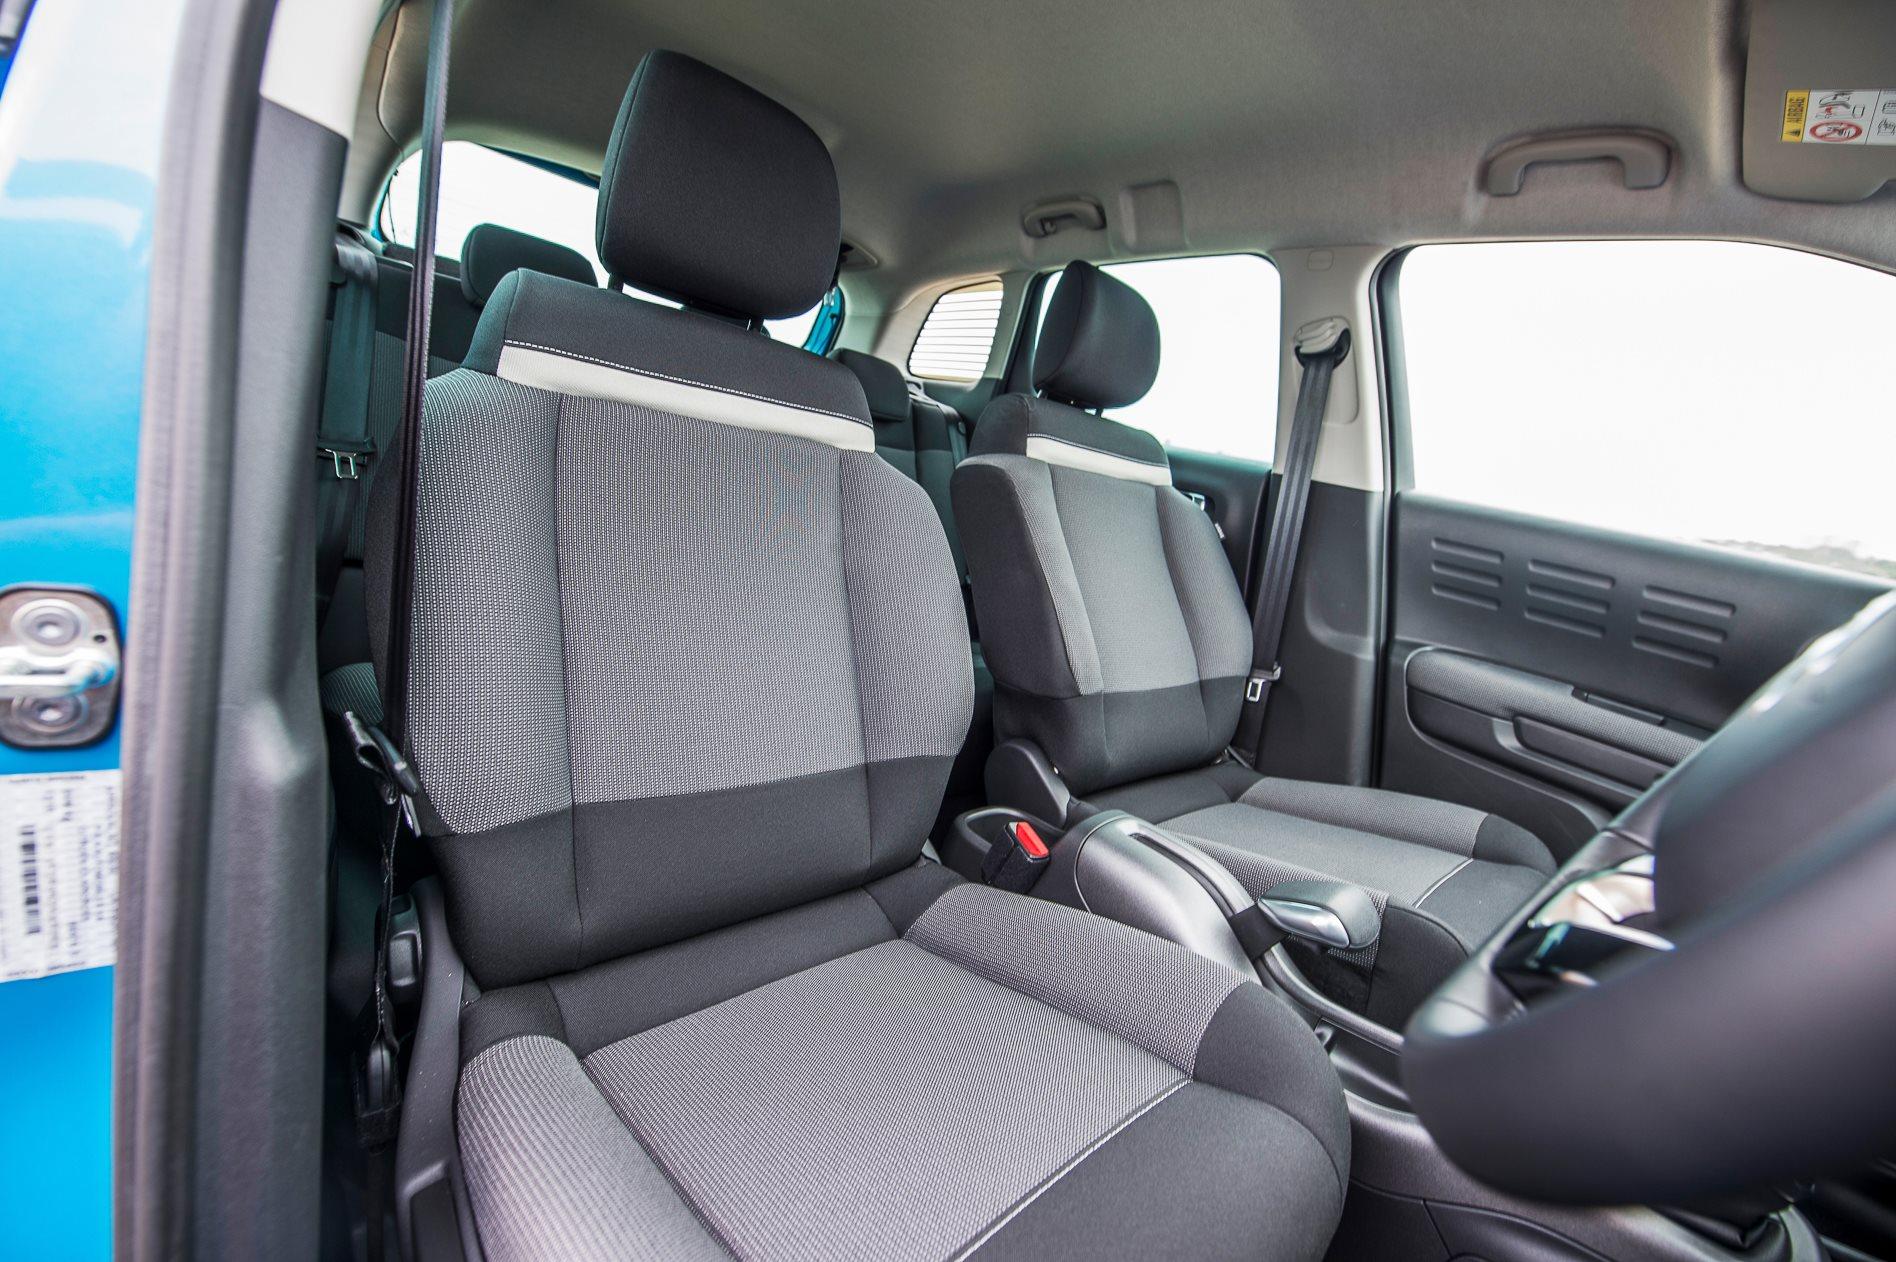 2019 Citroen C3 Aircross review